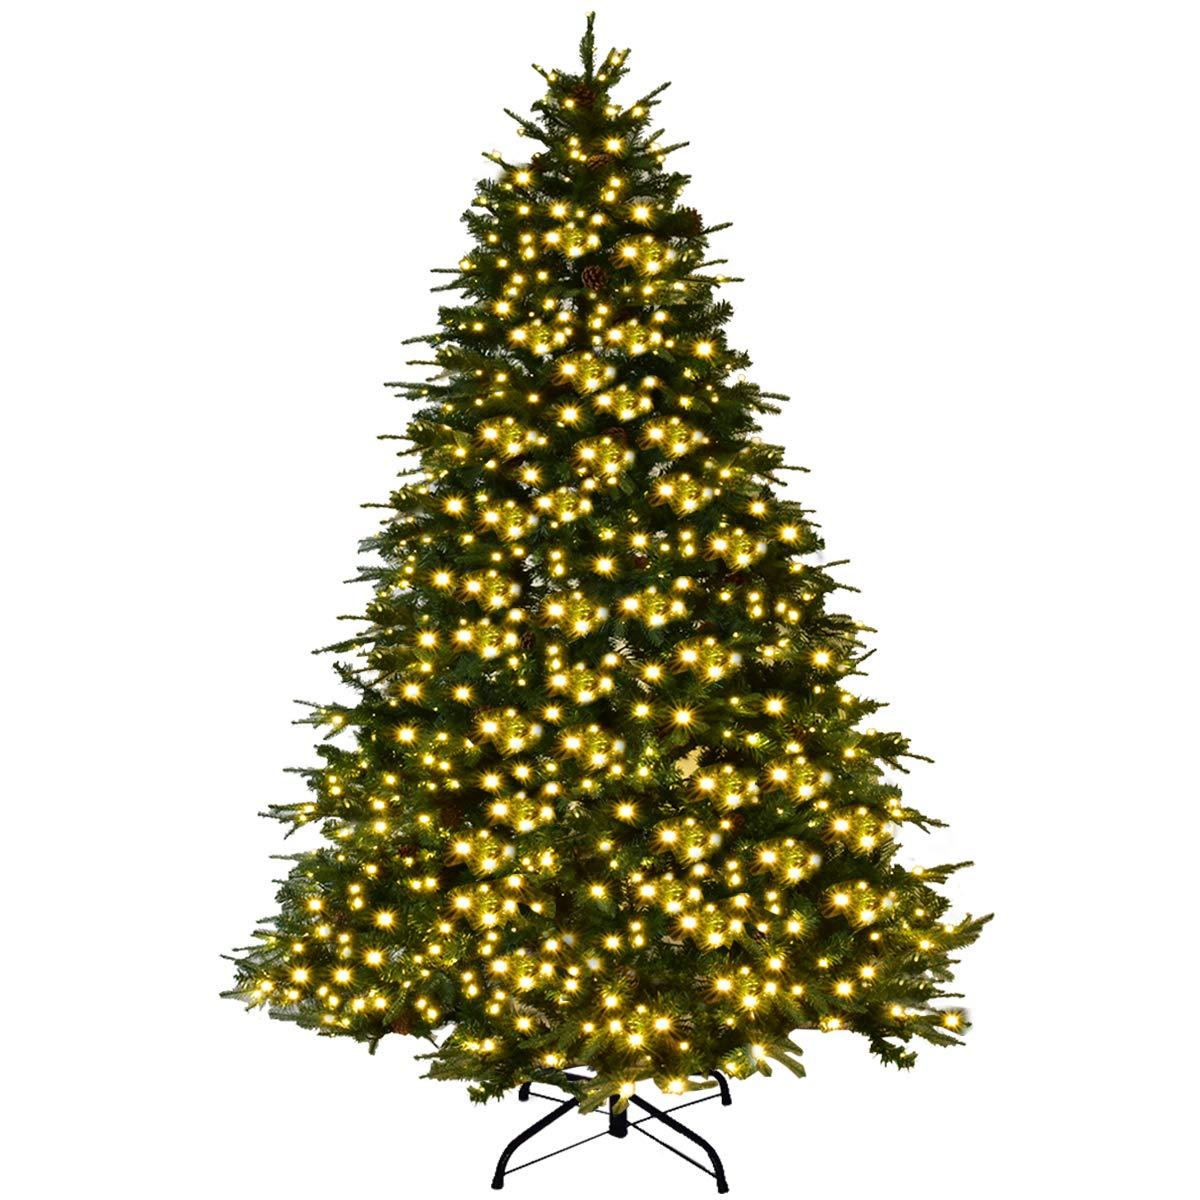 Goplus 7Ft Pre-Lit Artificial Christmas Tree Premium Spruce Hinged Tree w/ 460 LED Lights & Pine Cones